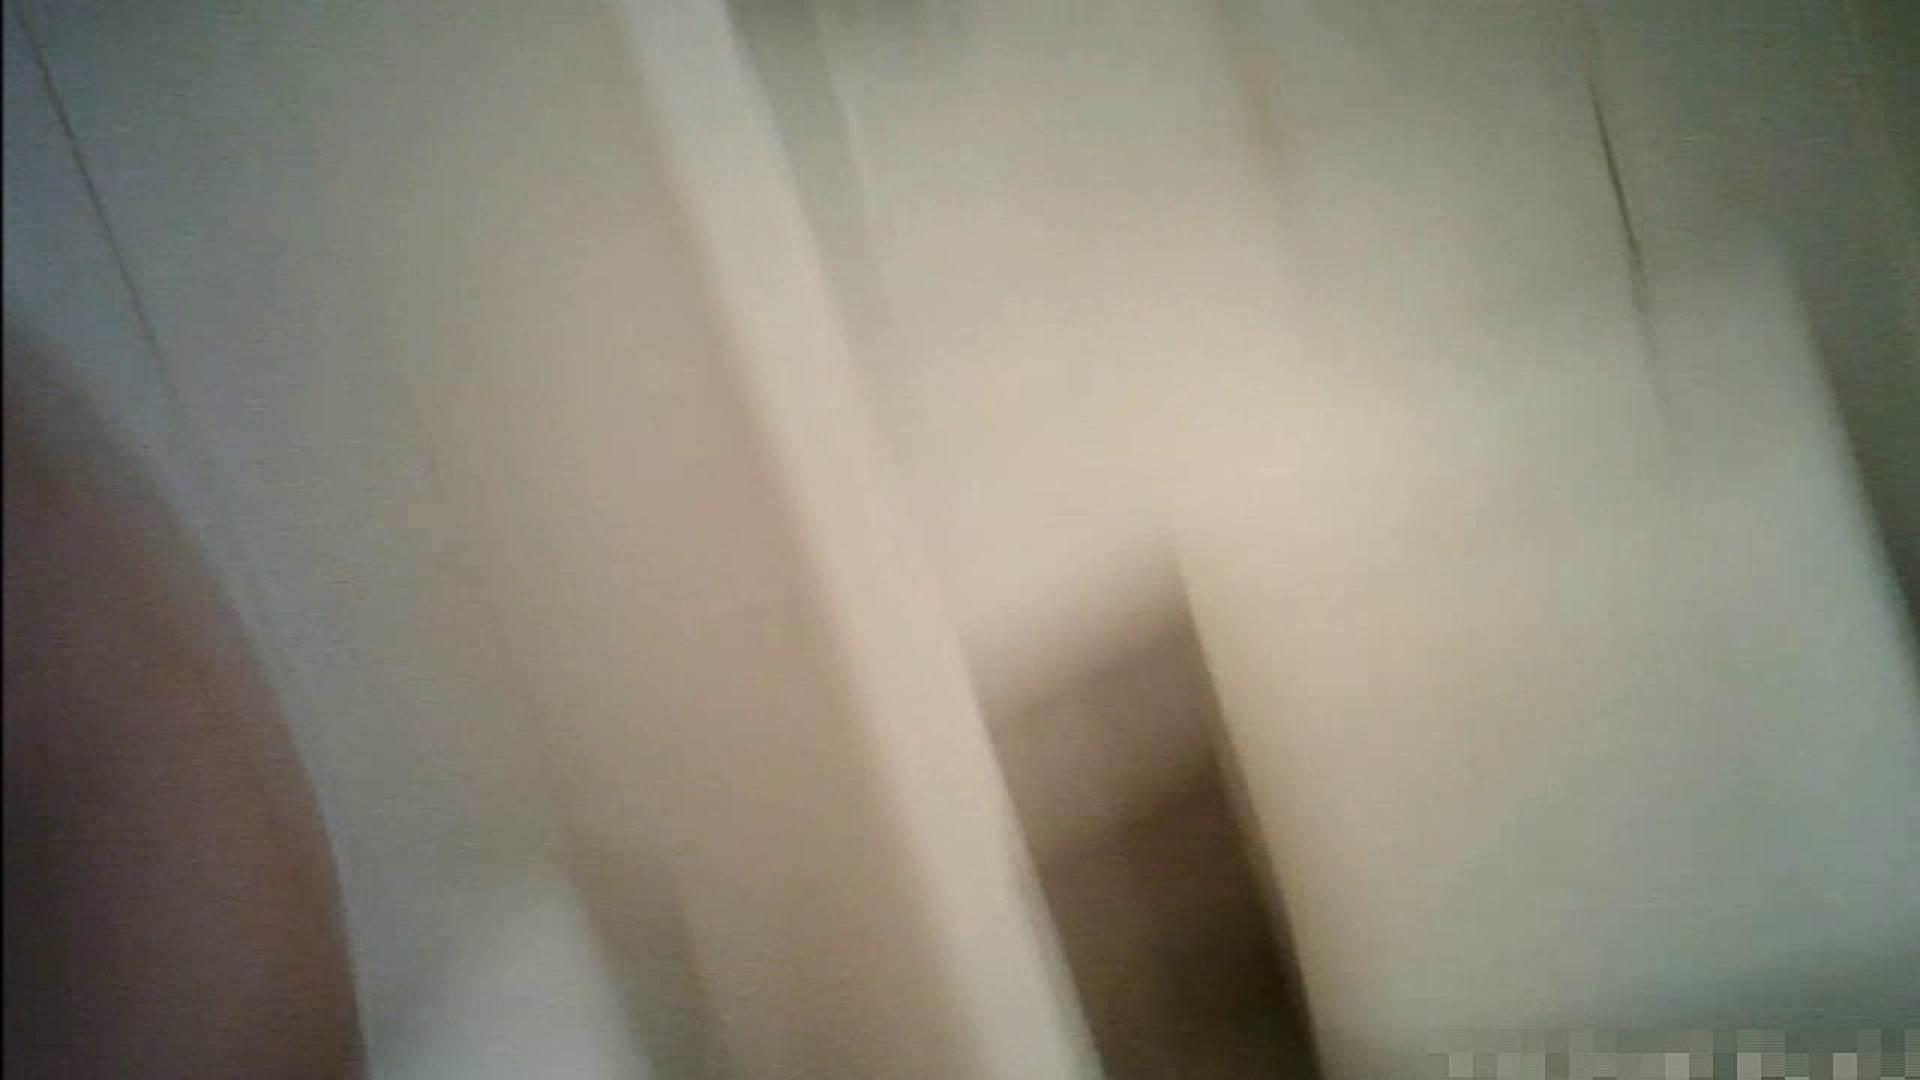 vol.7 【Mちゃん(入浴)】ブランド品査定士19歳 巨乳ギャル 女湯の中 アダルト動画キャプチャ 64画像 42